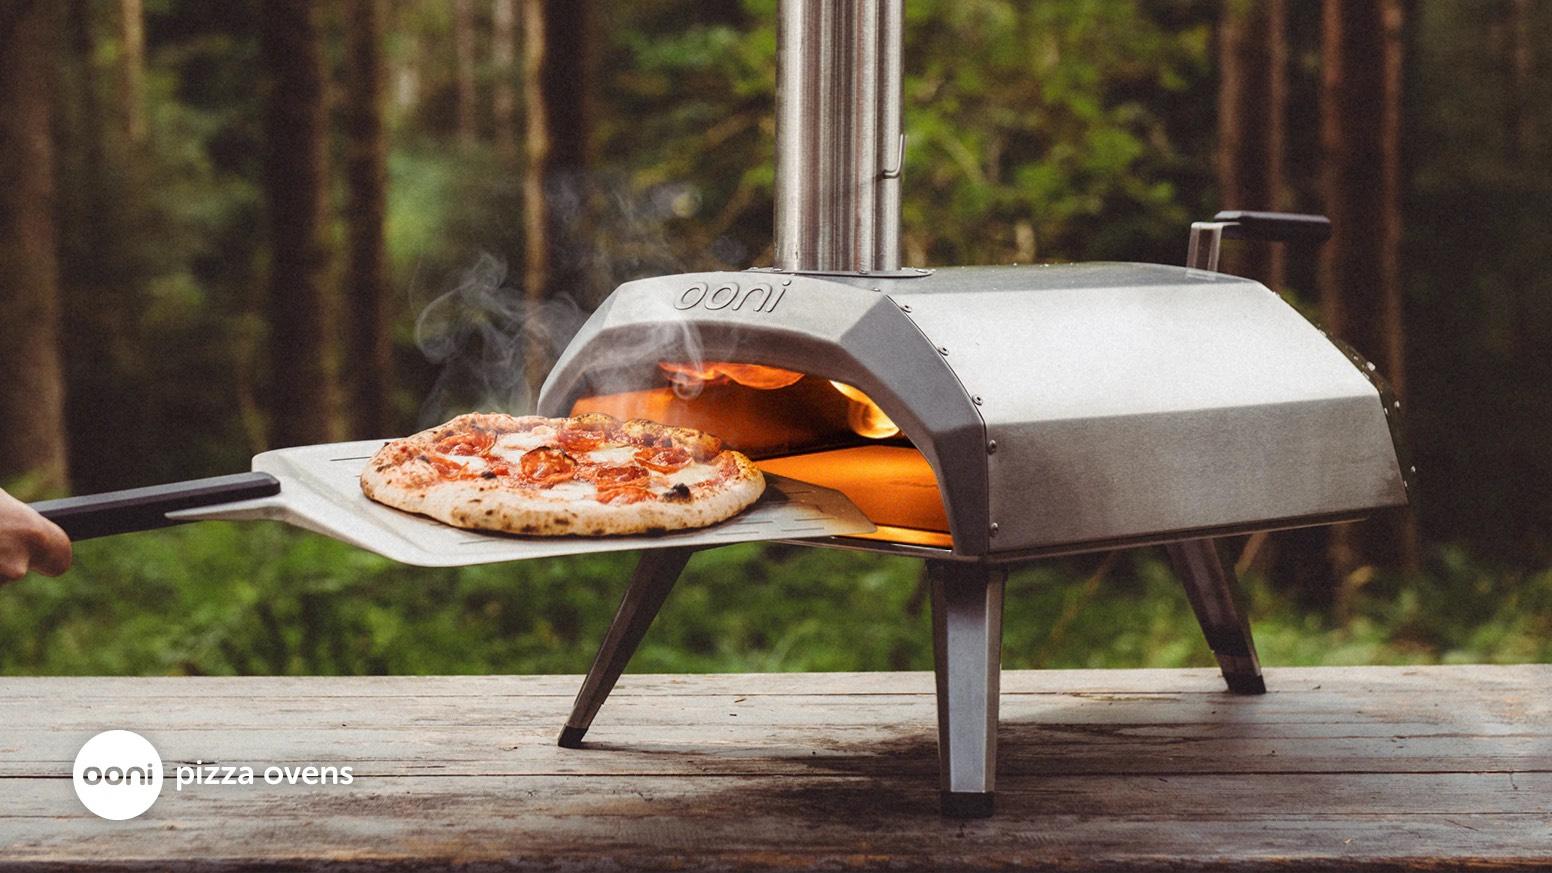 Ooni Pizzaofen Black Friday Deal -20% auf Alles